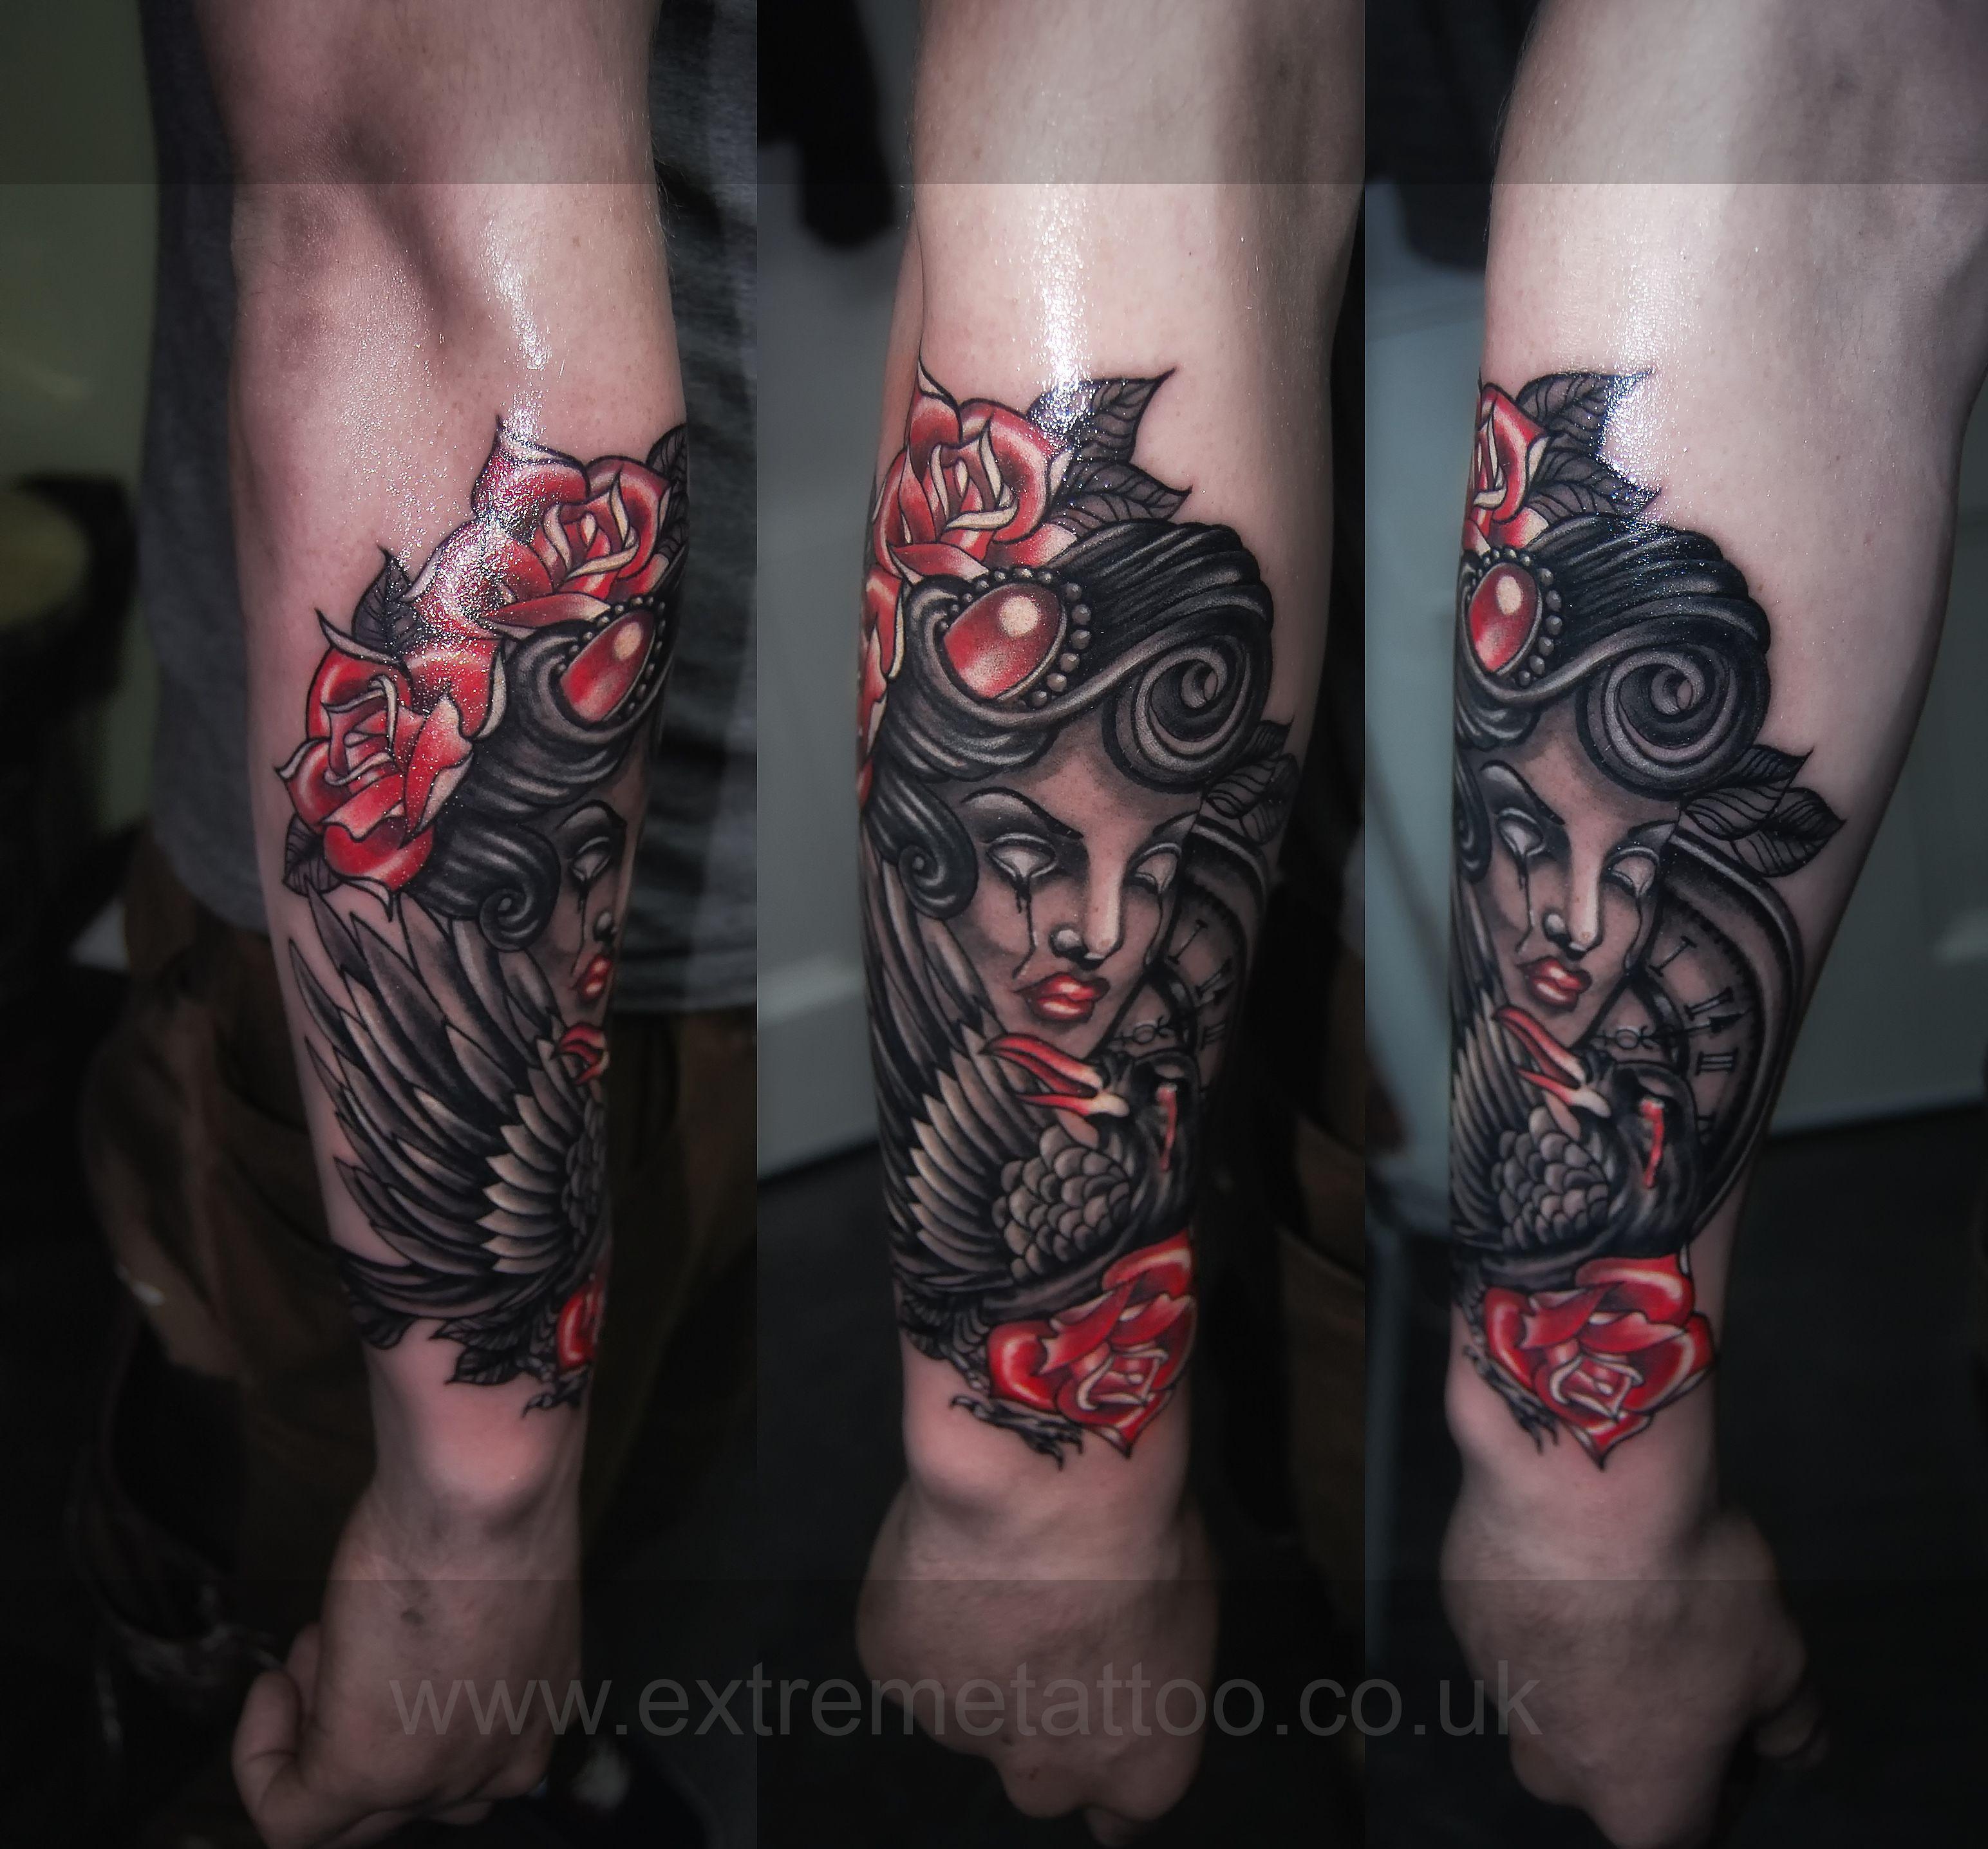 Tattoo Woman Zombie: Zombie Girl Roses Crow Tattoo Sleeve In Progress,Gabi